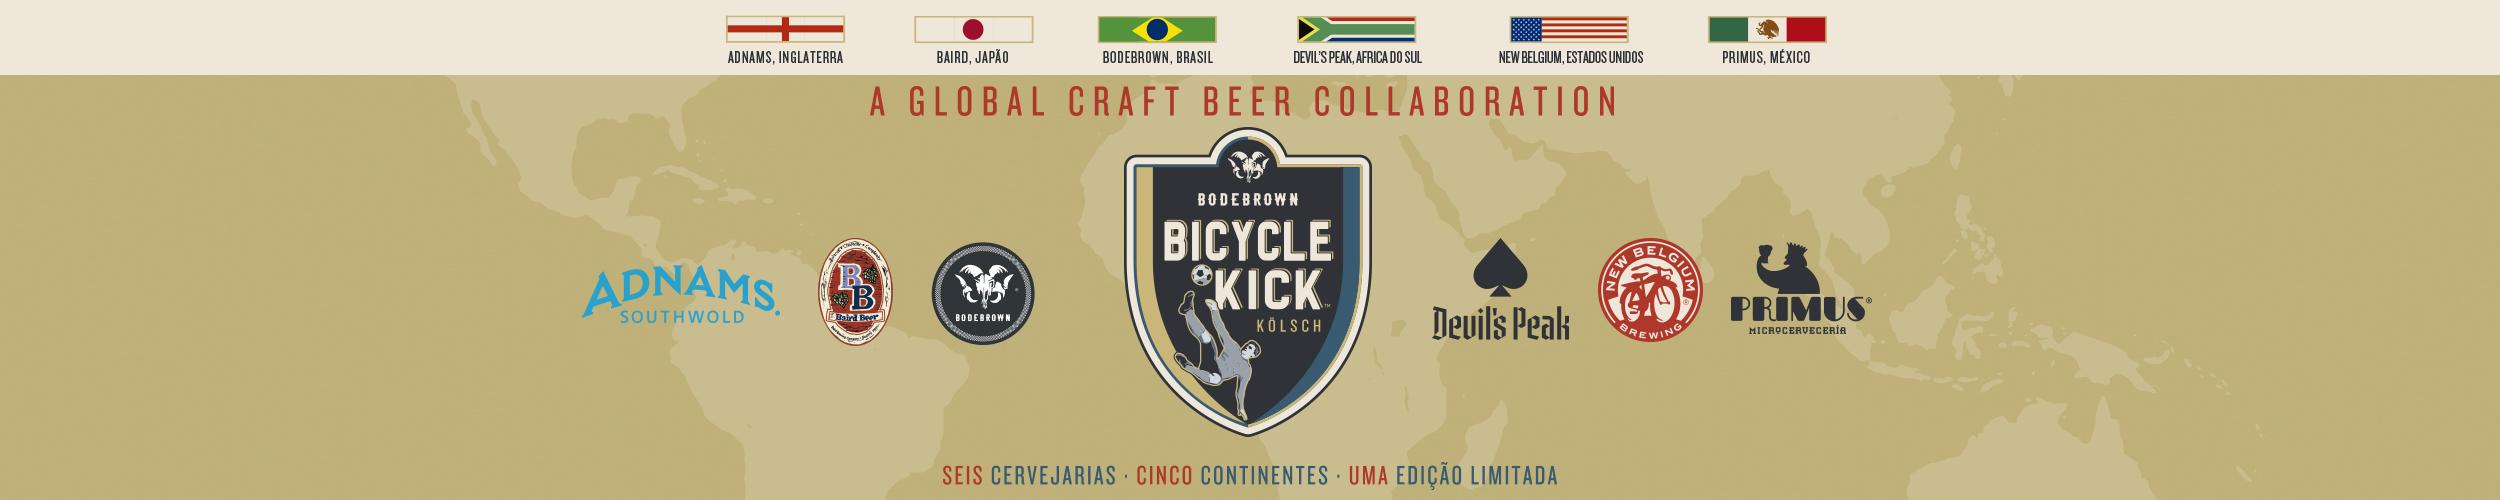 bicycle-kicks